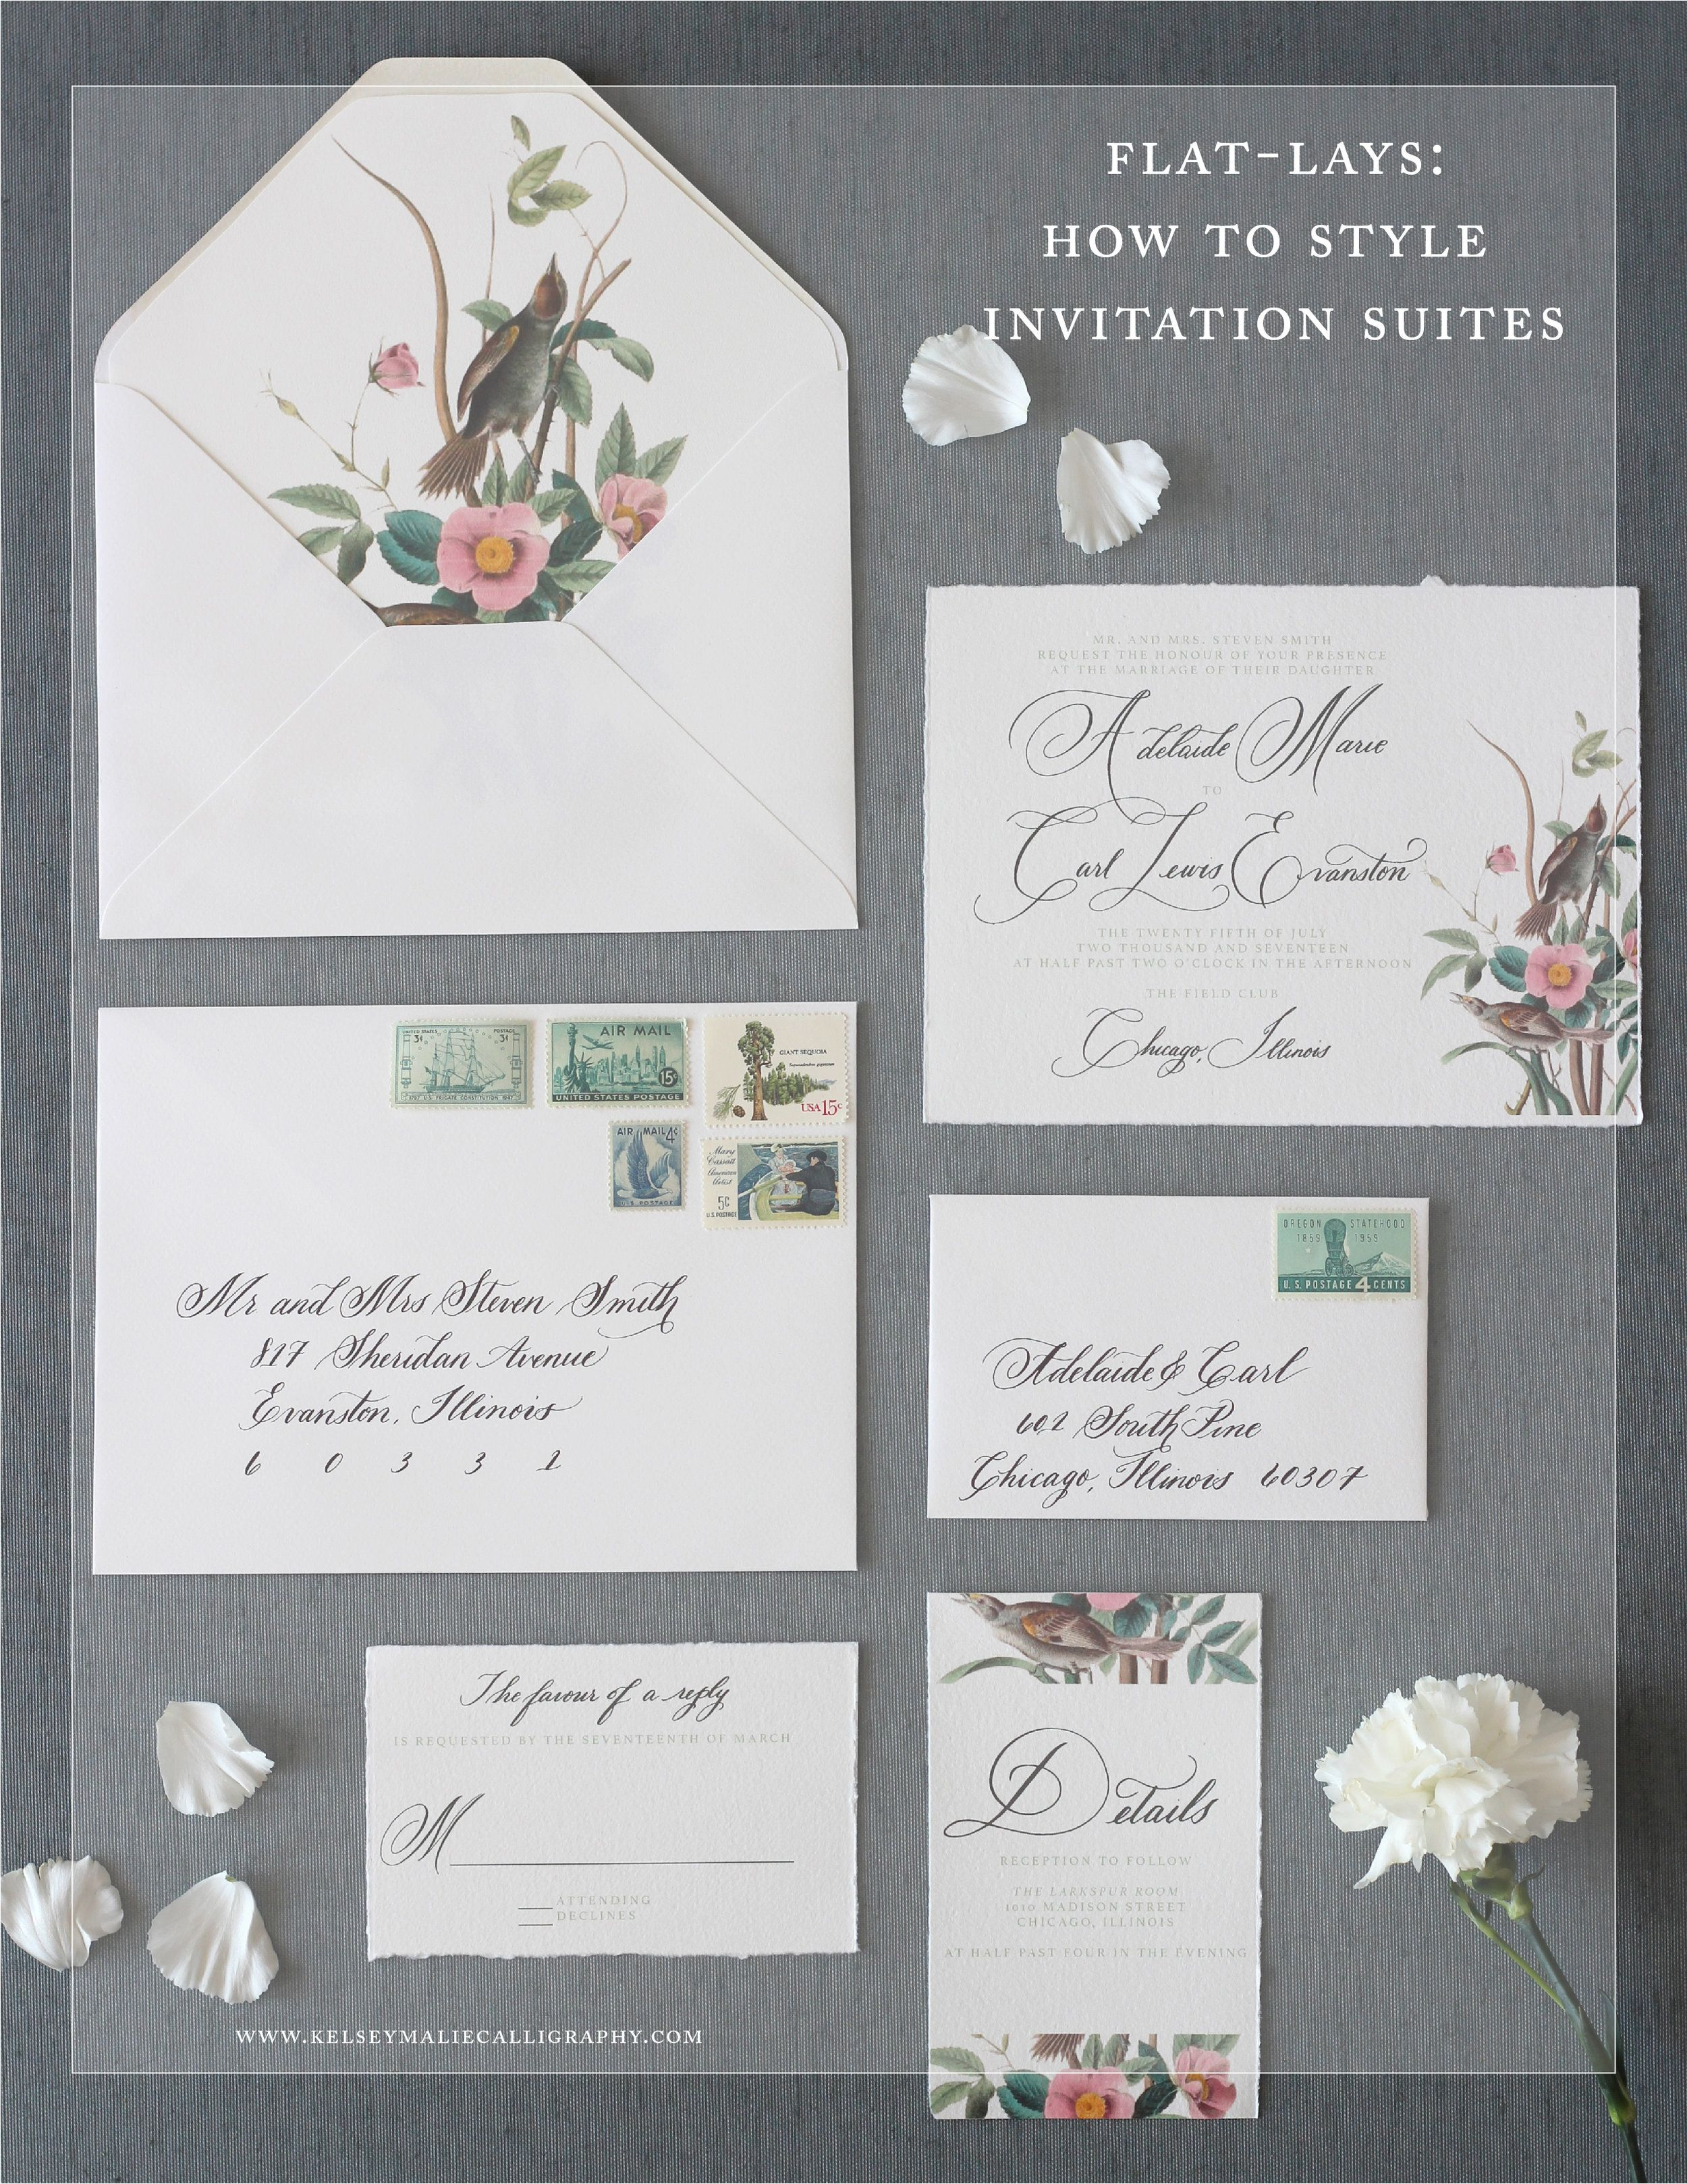 FlatLays How to Style Wedding Invitation Suites